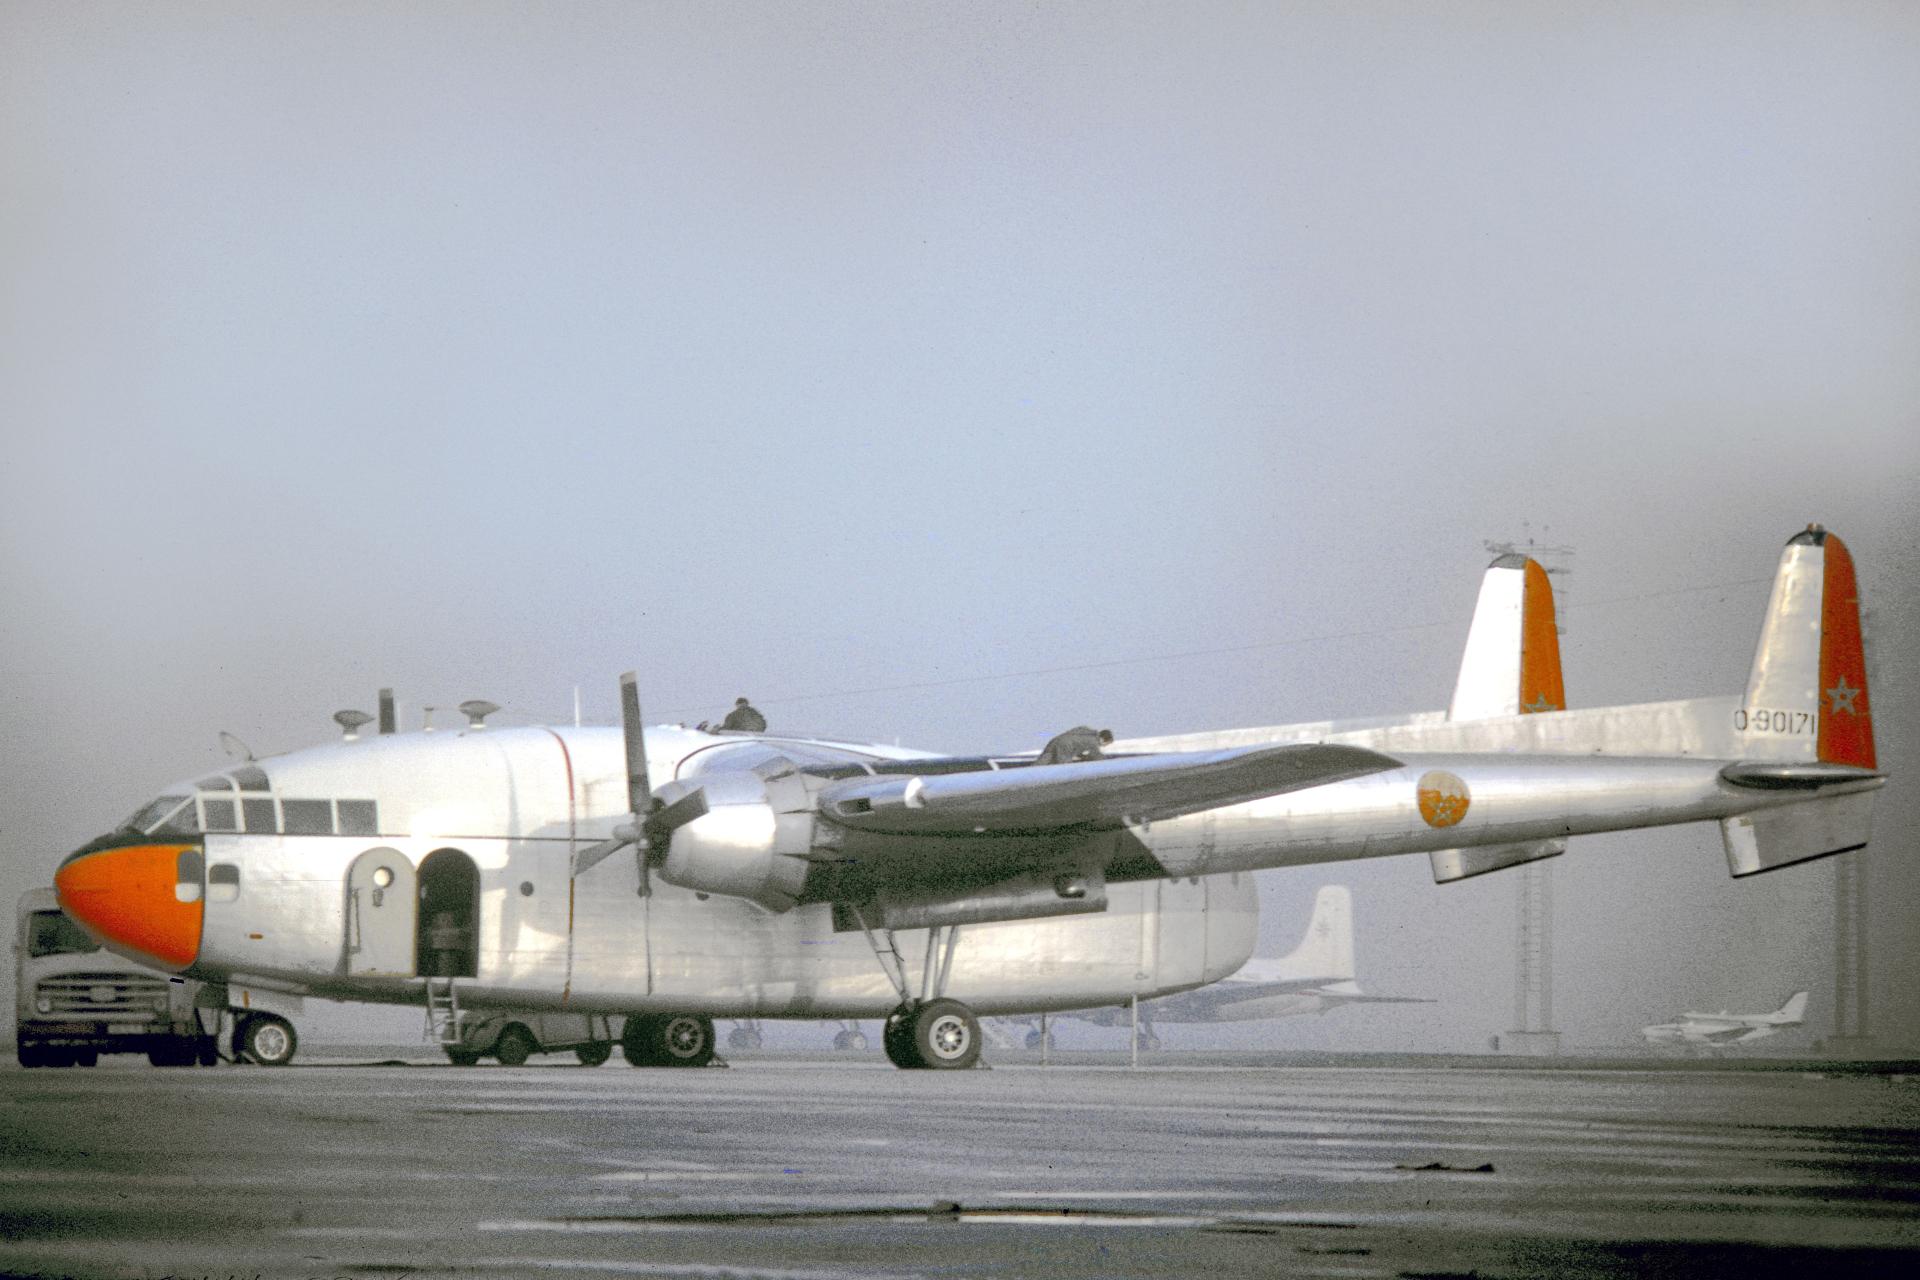 FRA: Photos anciens avions des FRA - Page 7 151220063124610810